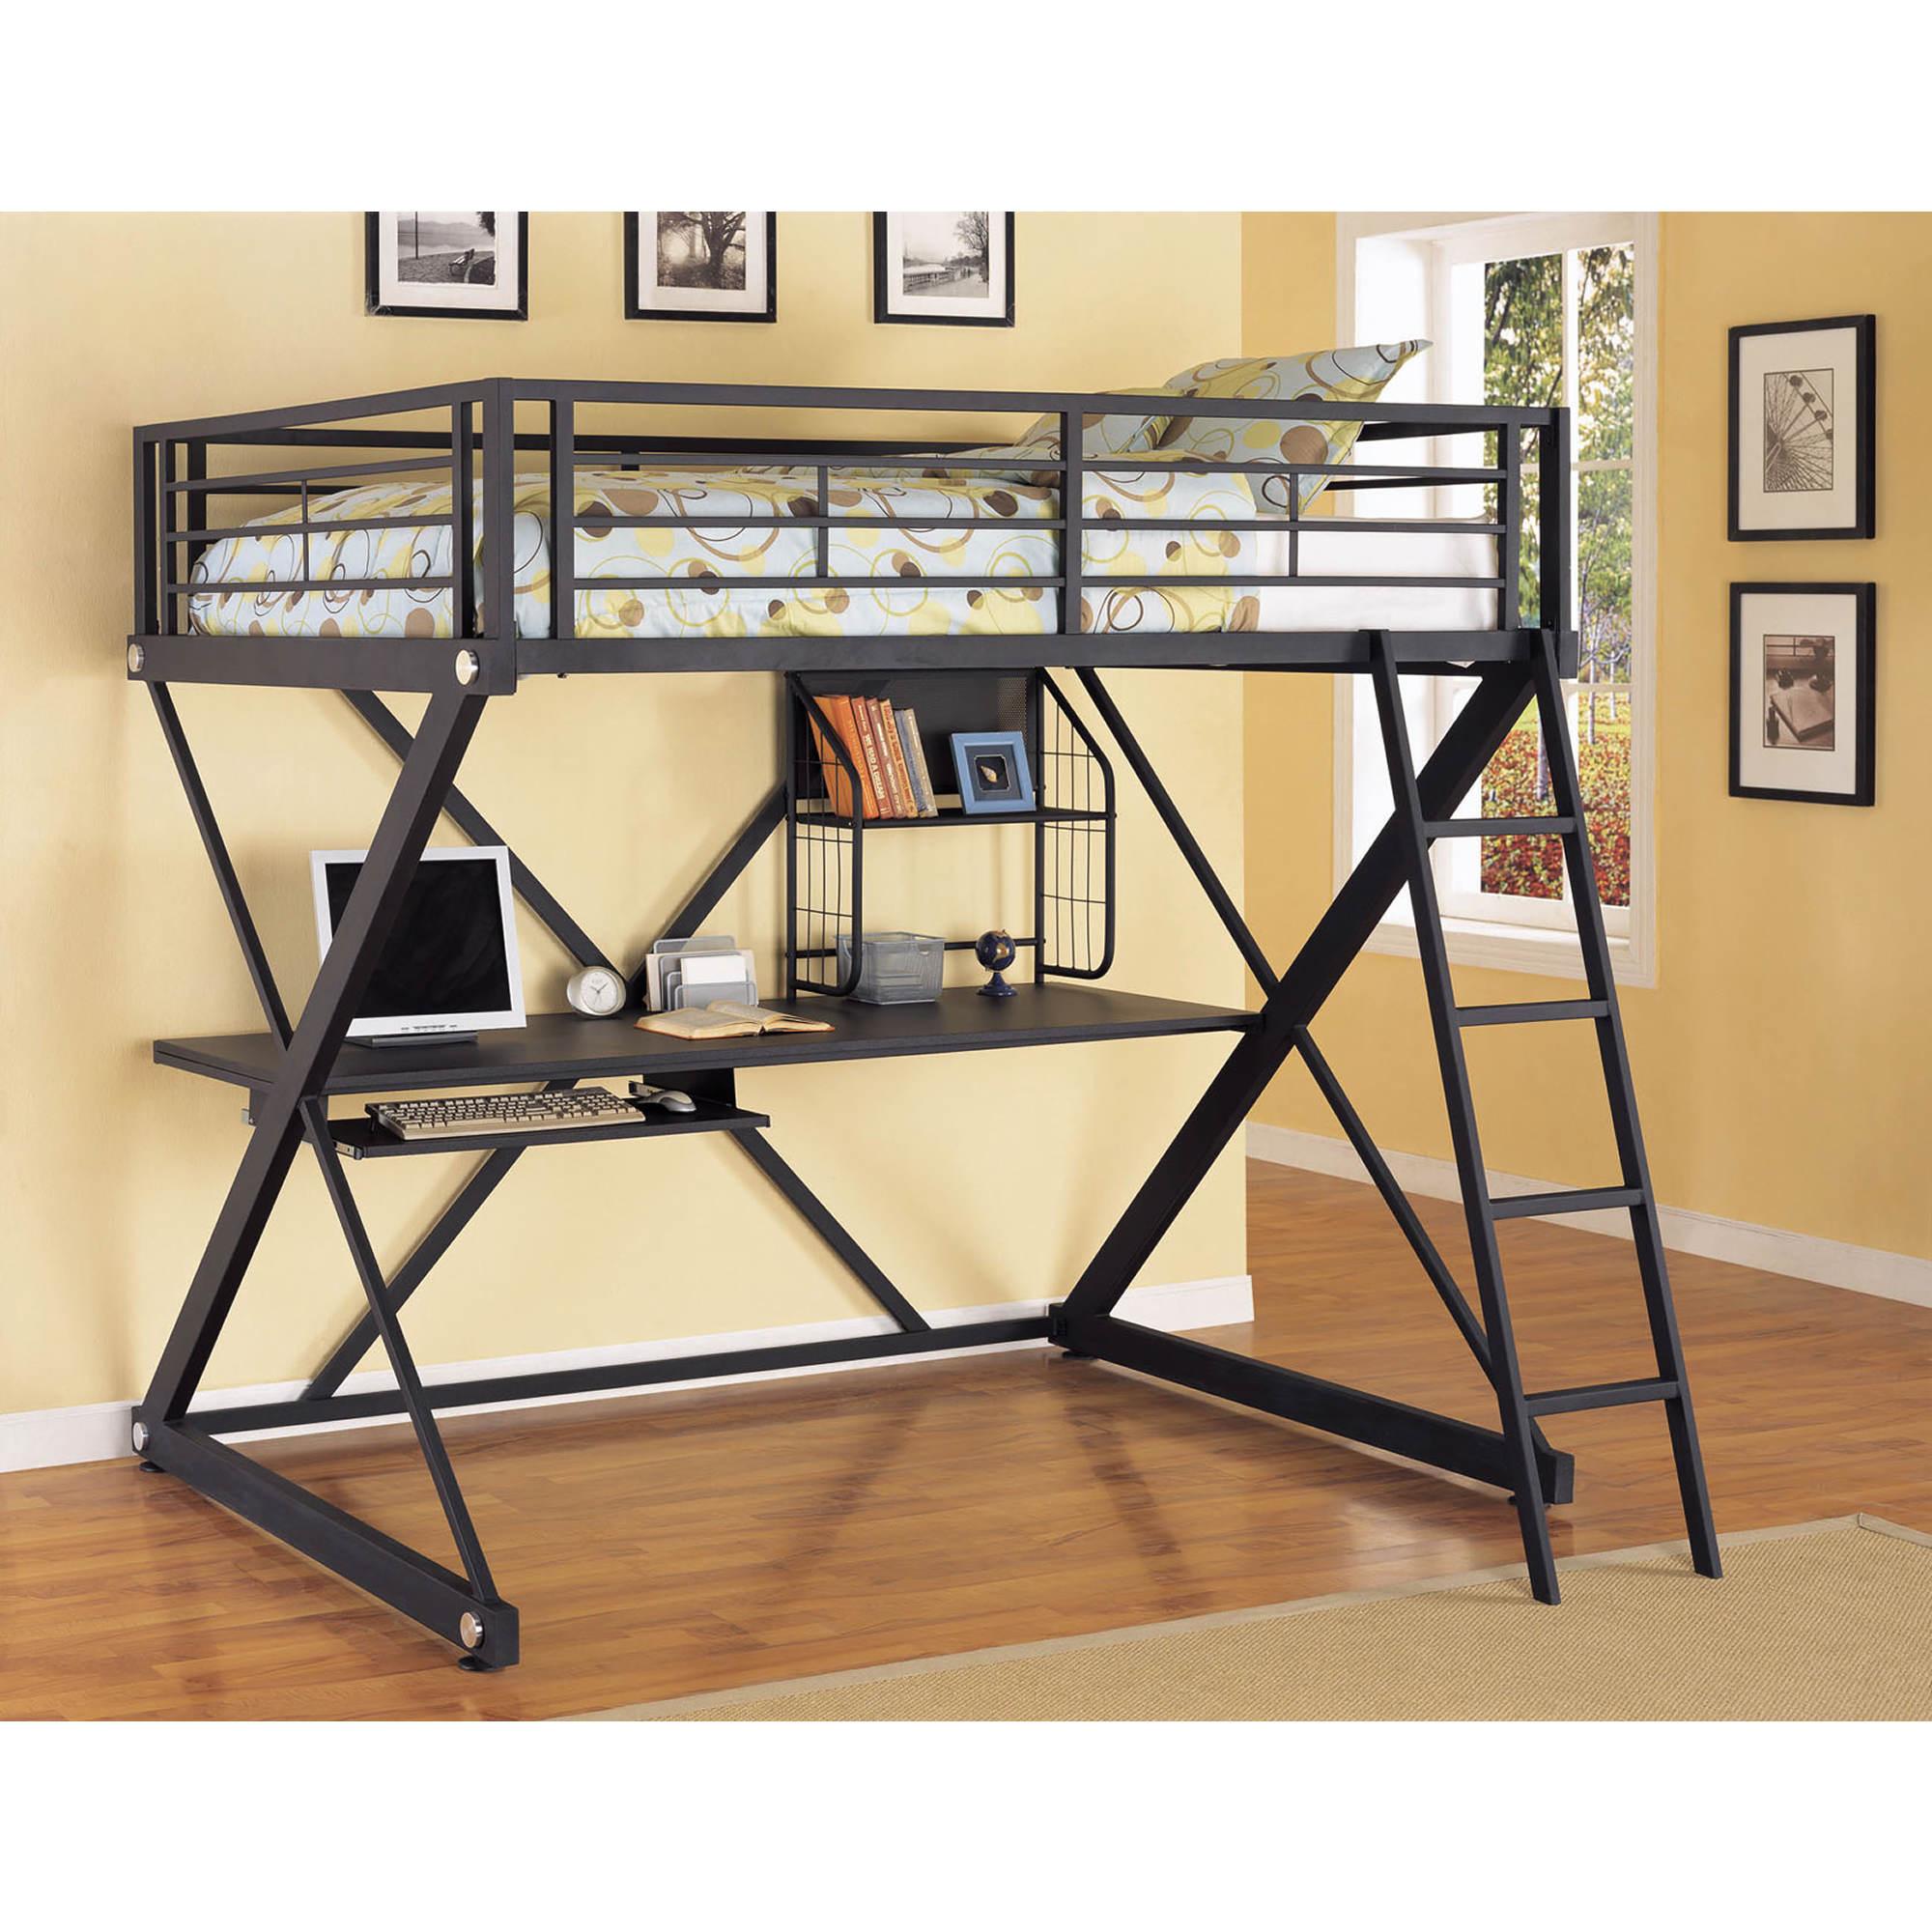 Loft bed for full size mattress - Powell Z Bedroom Full Size Study Loft Bunk Bed Textured Black